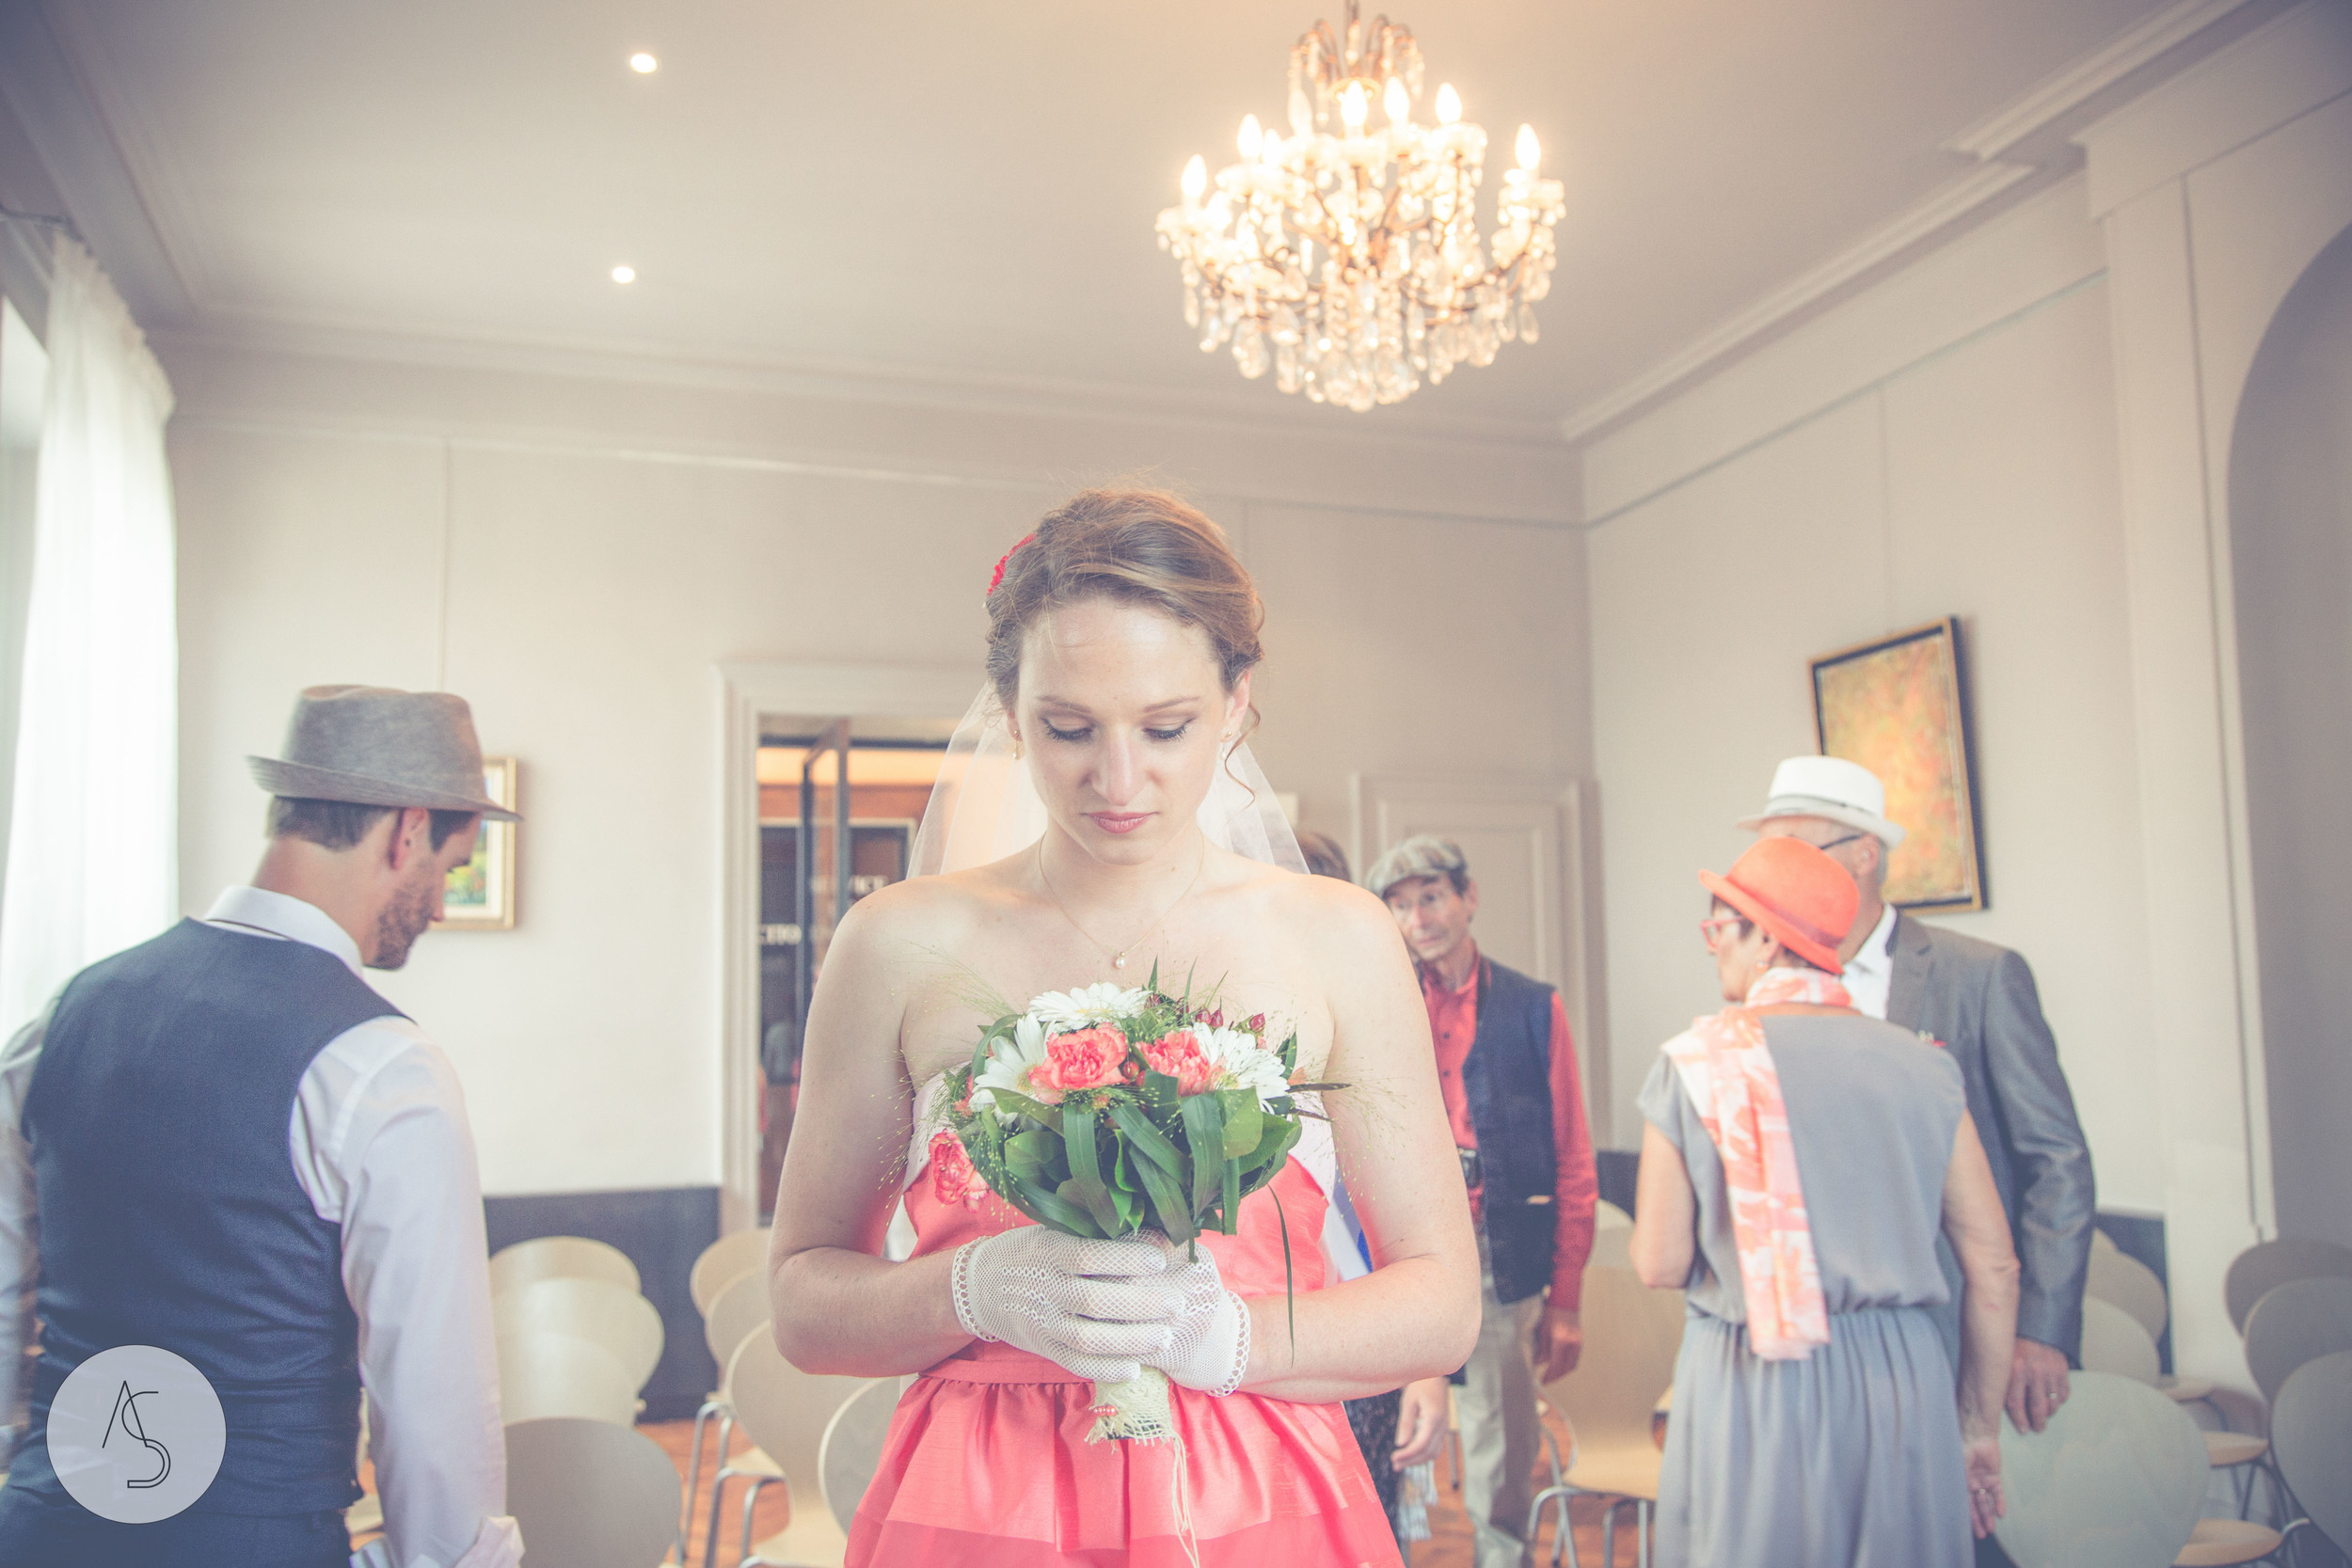 photographe mariage - Grenoble - Rhone Alpes - Adriana Salazar photo-68.jpg